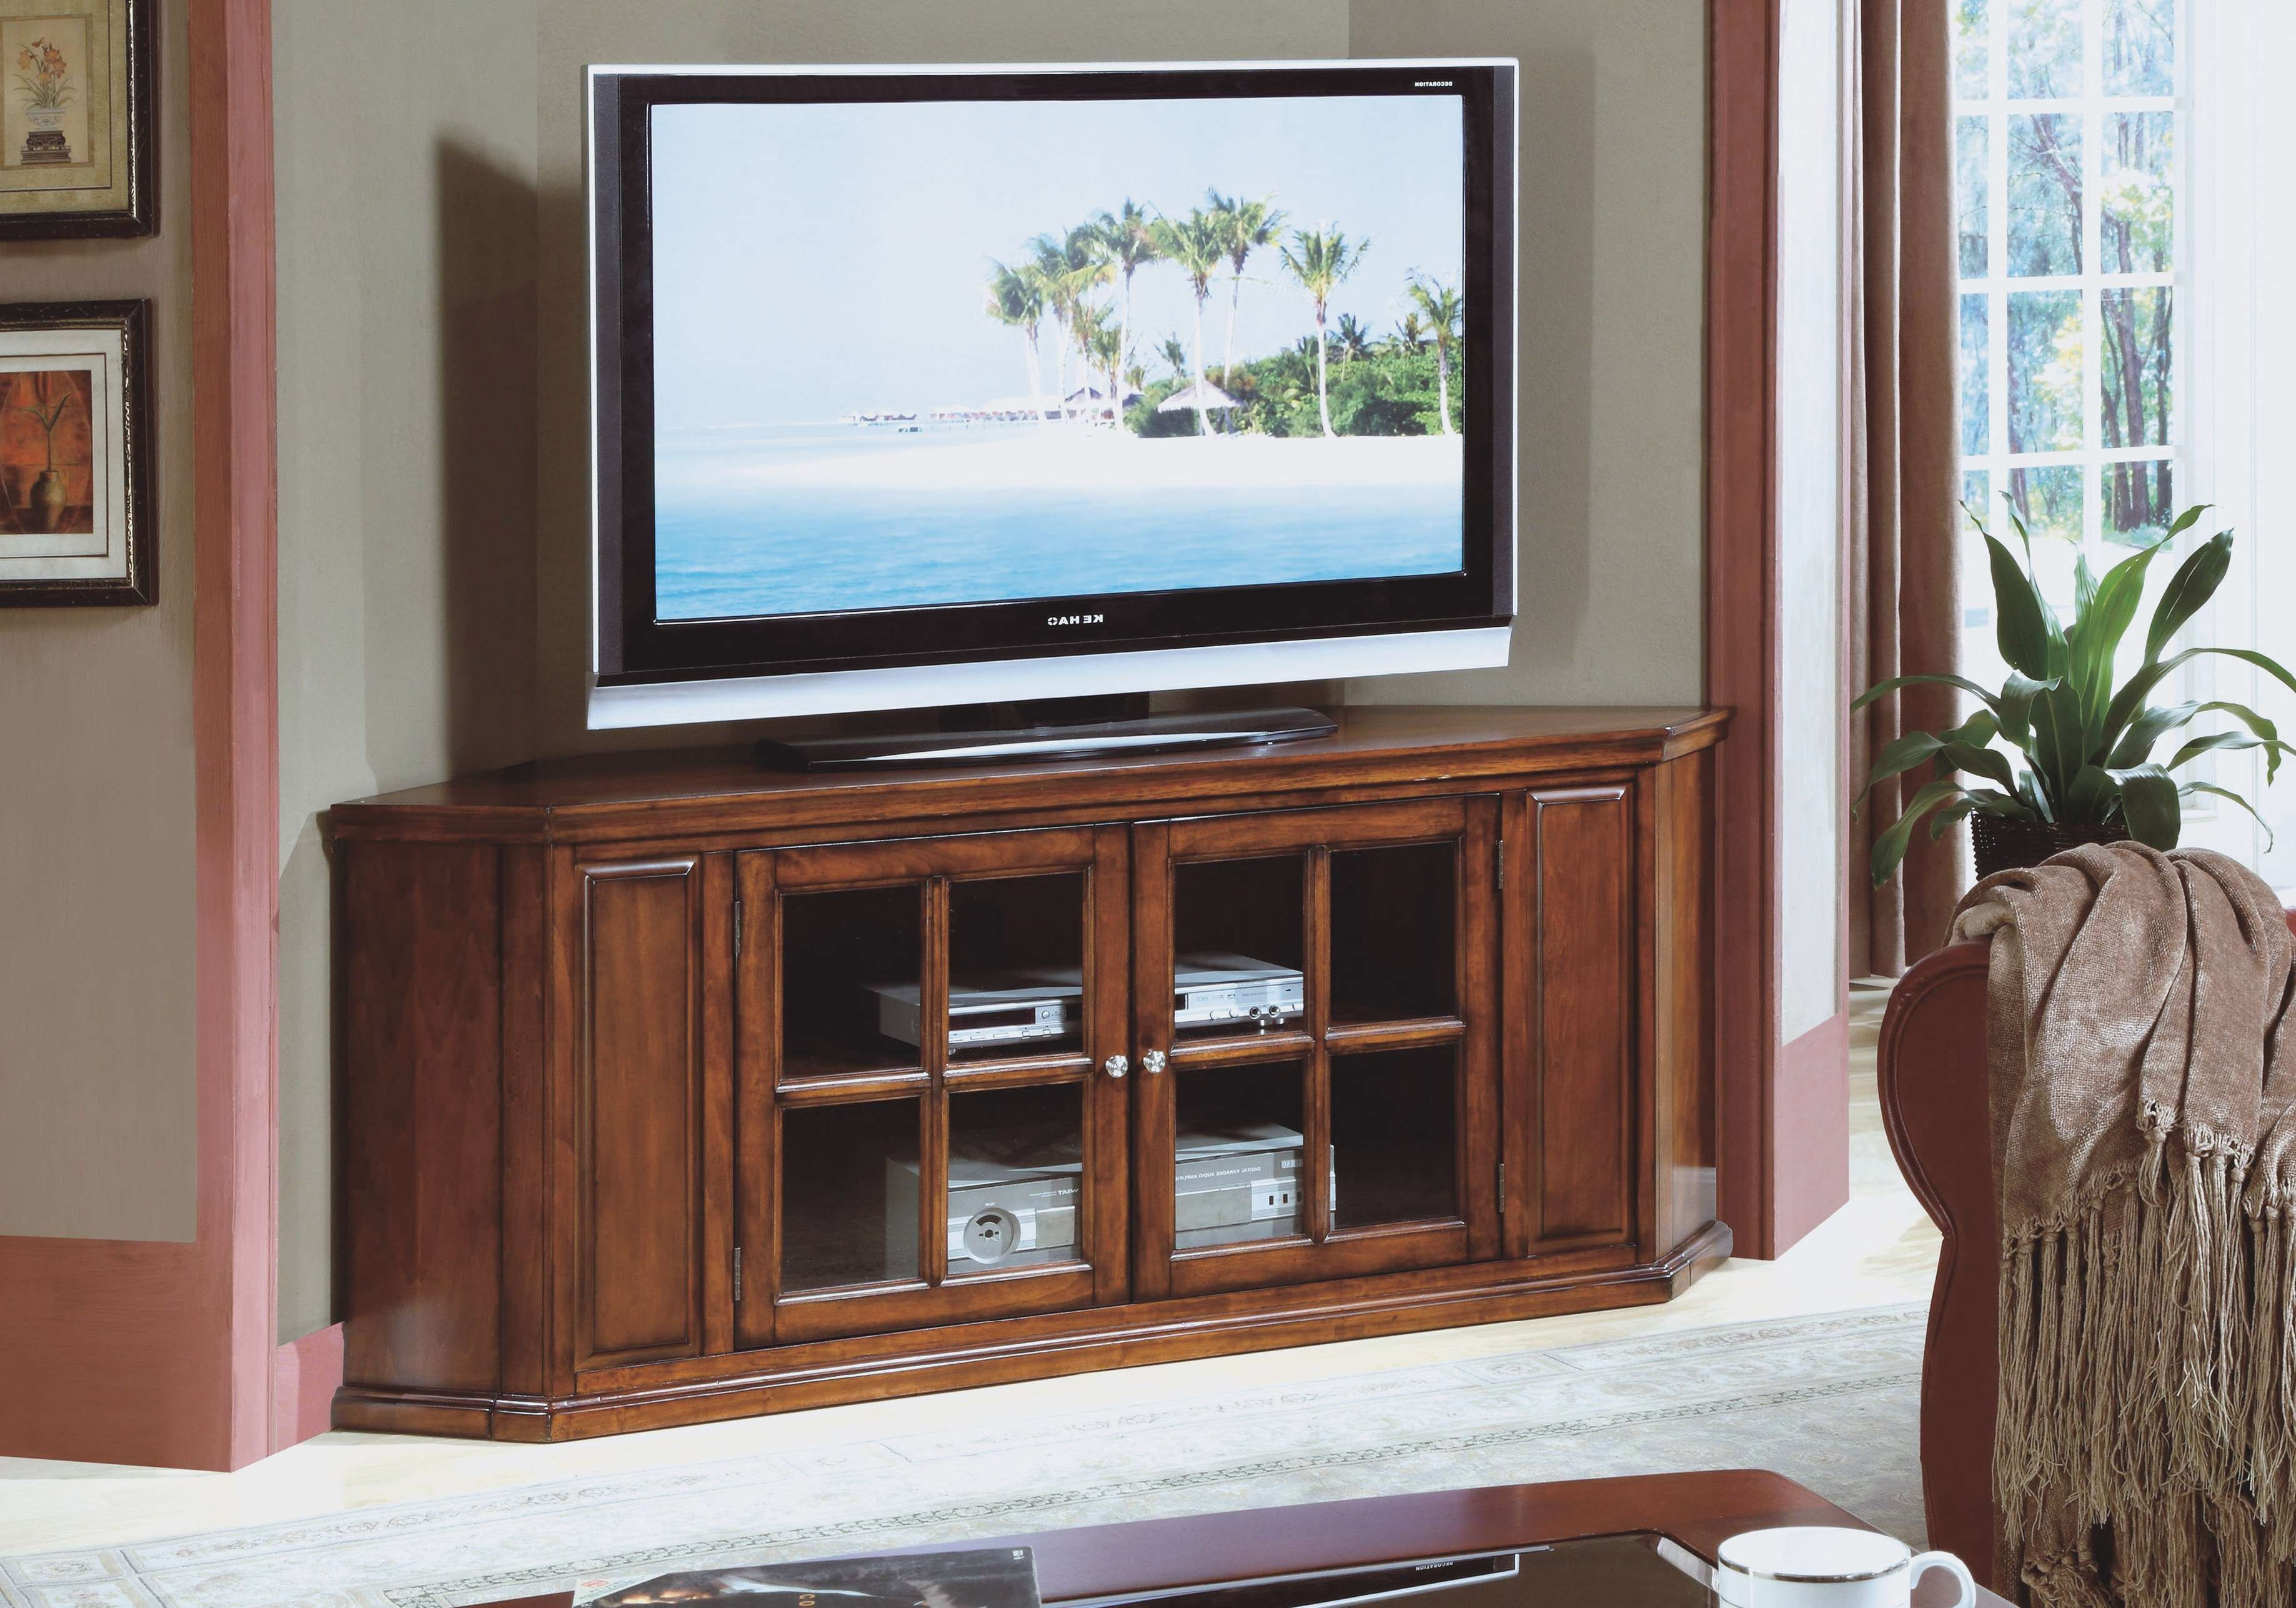 Oak Tv Cabinet With Doors Gallery – Doors Design Ideas Inside Oak Tv Cabinets For Flat Screens With Doors (Gallery 15 of 20)